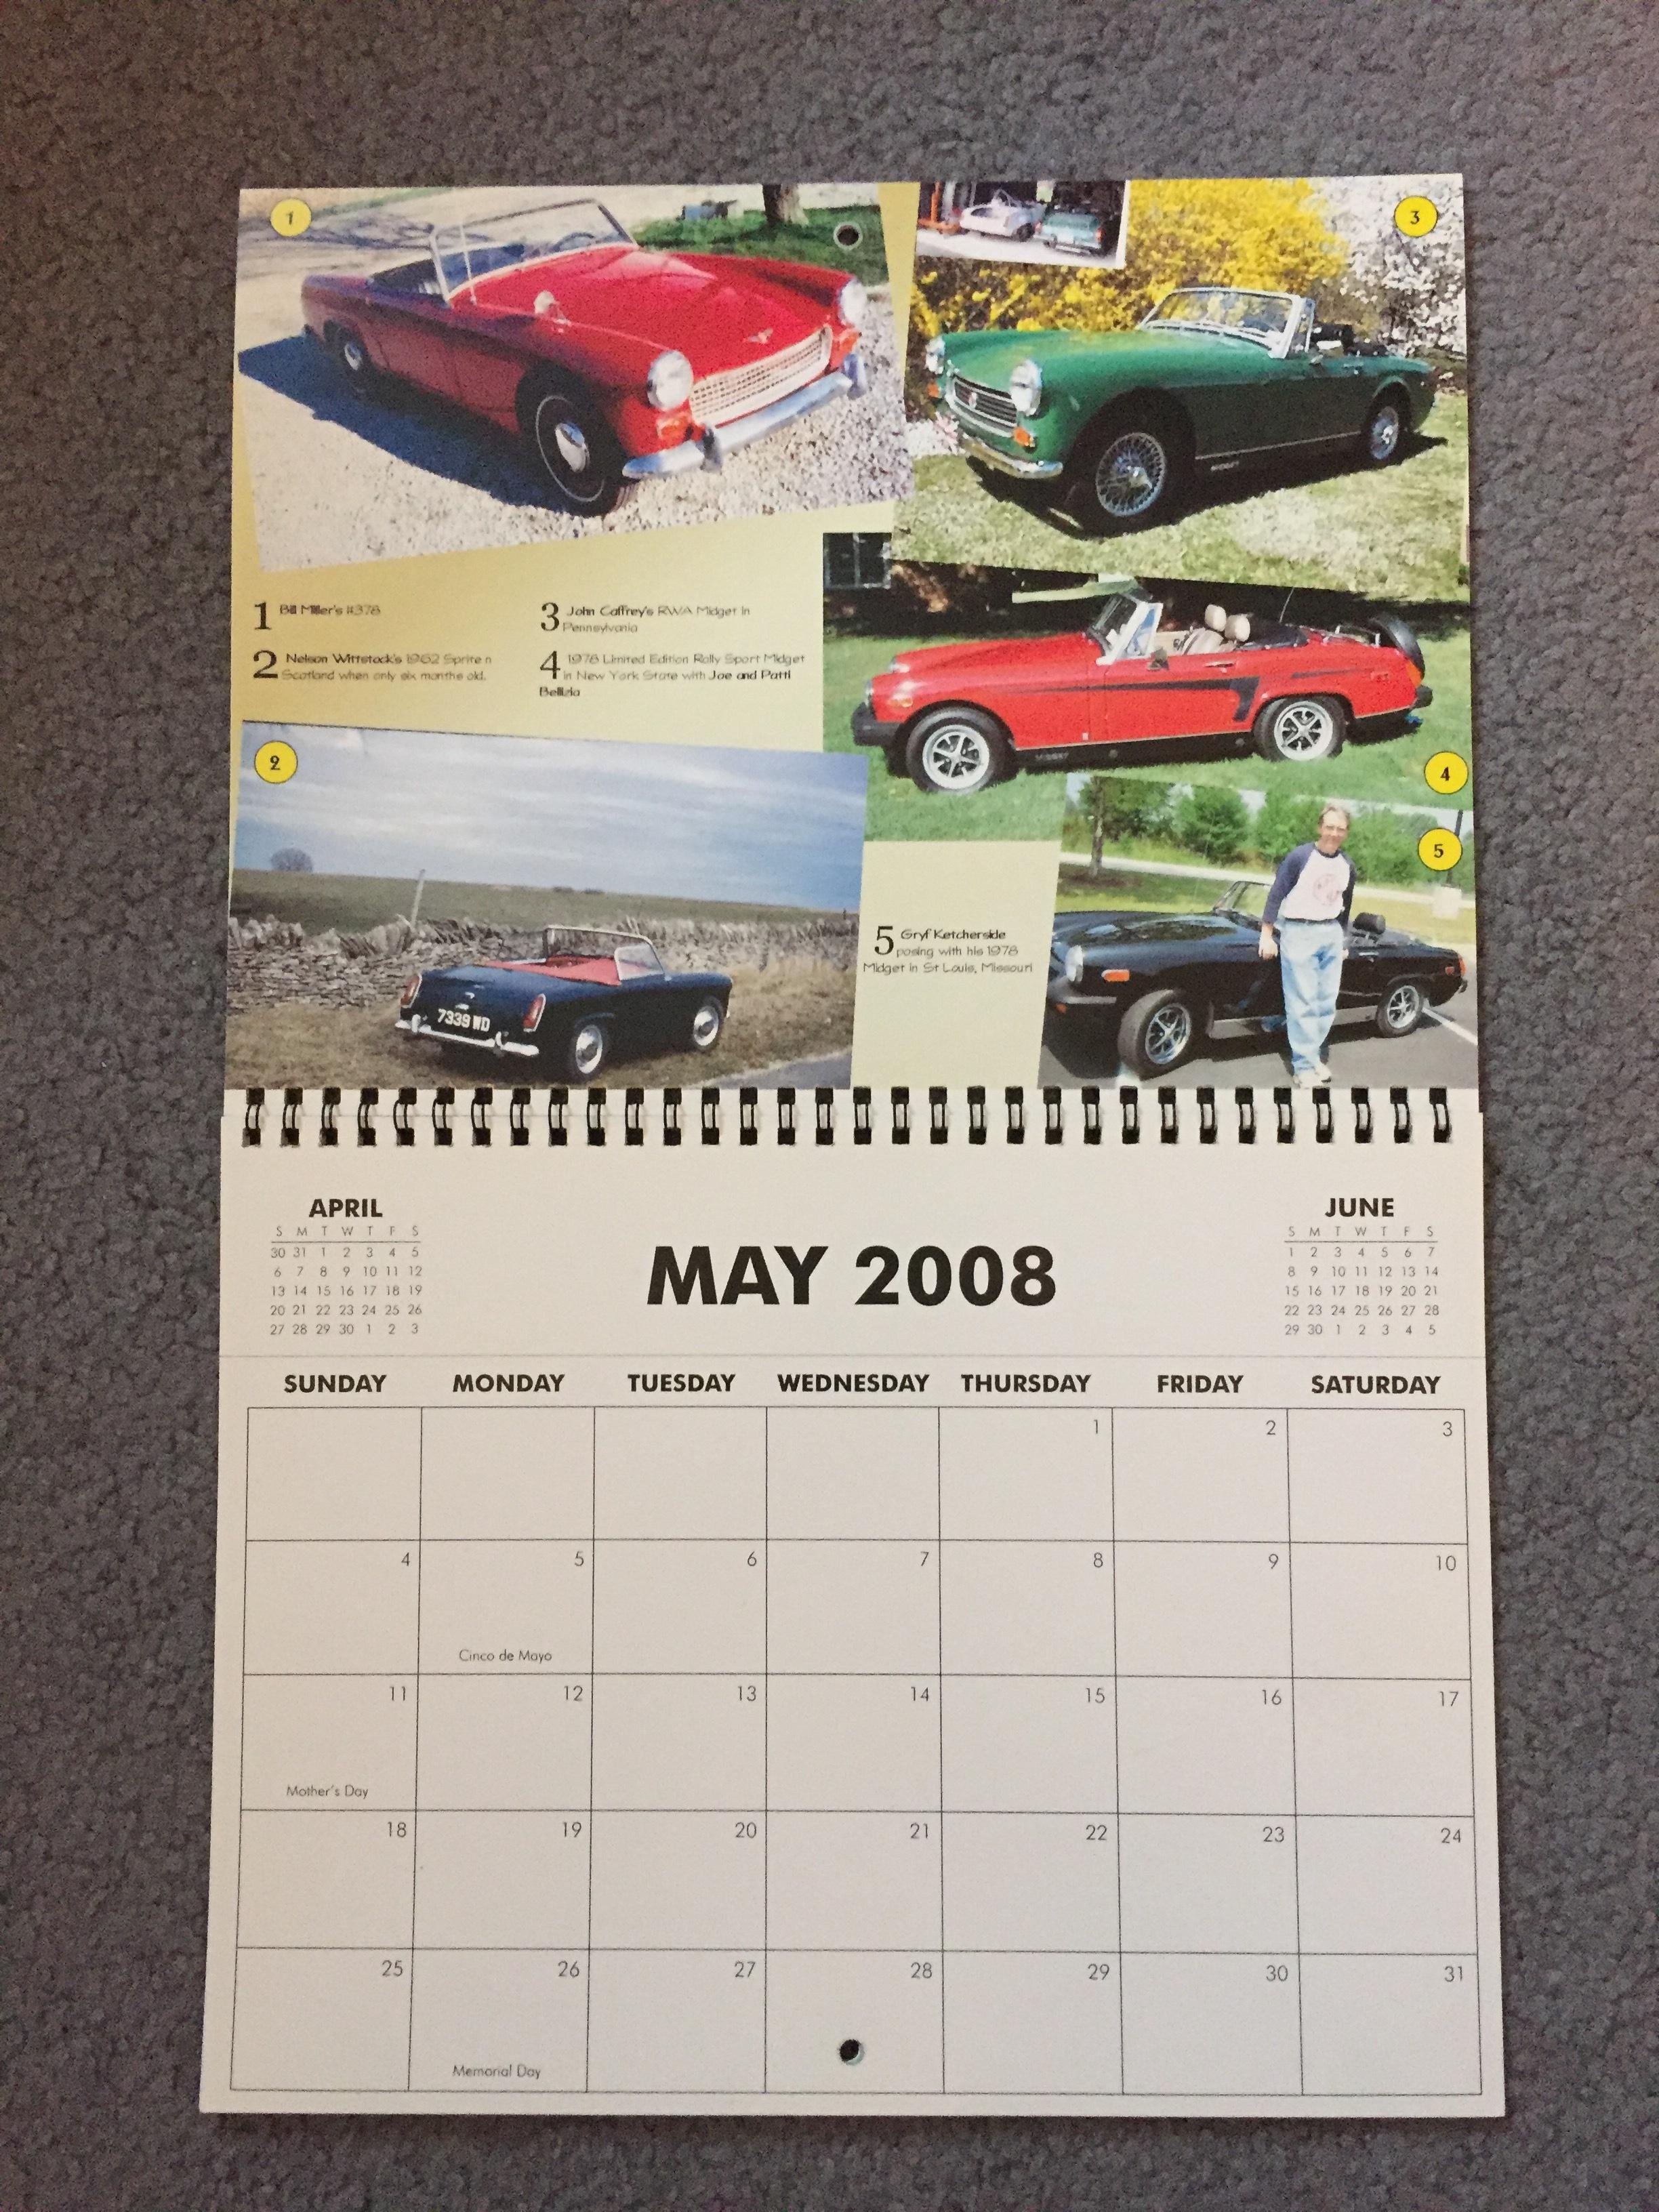 mg_calendar_may_08.jpg